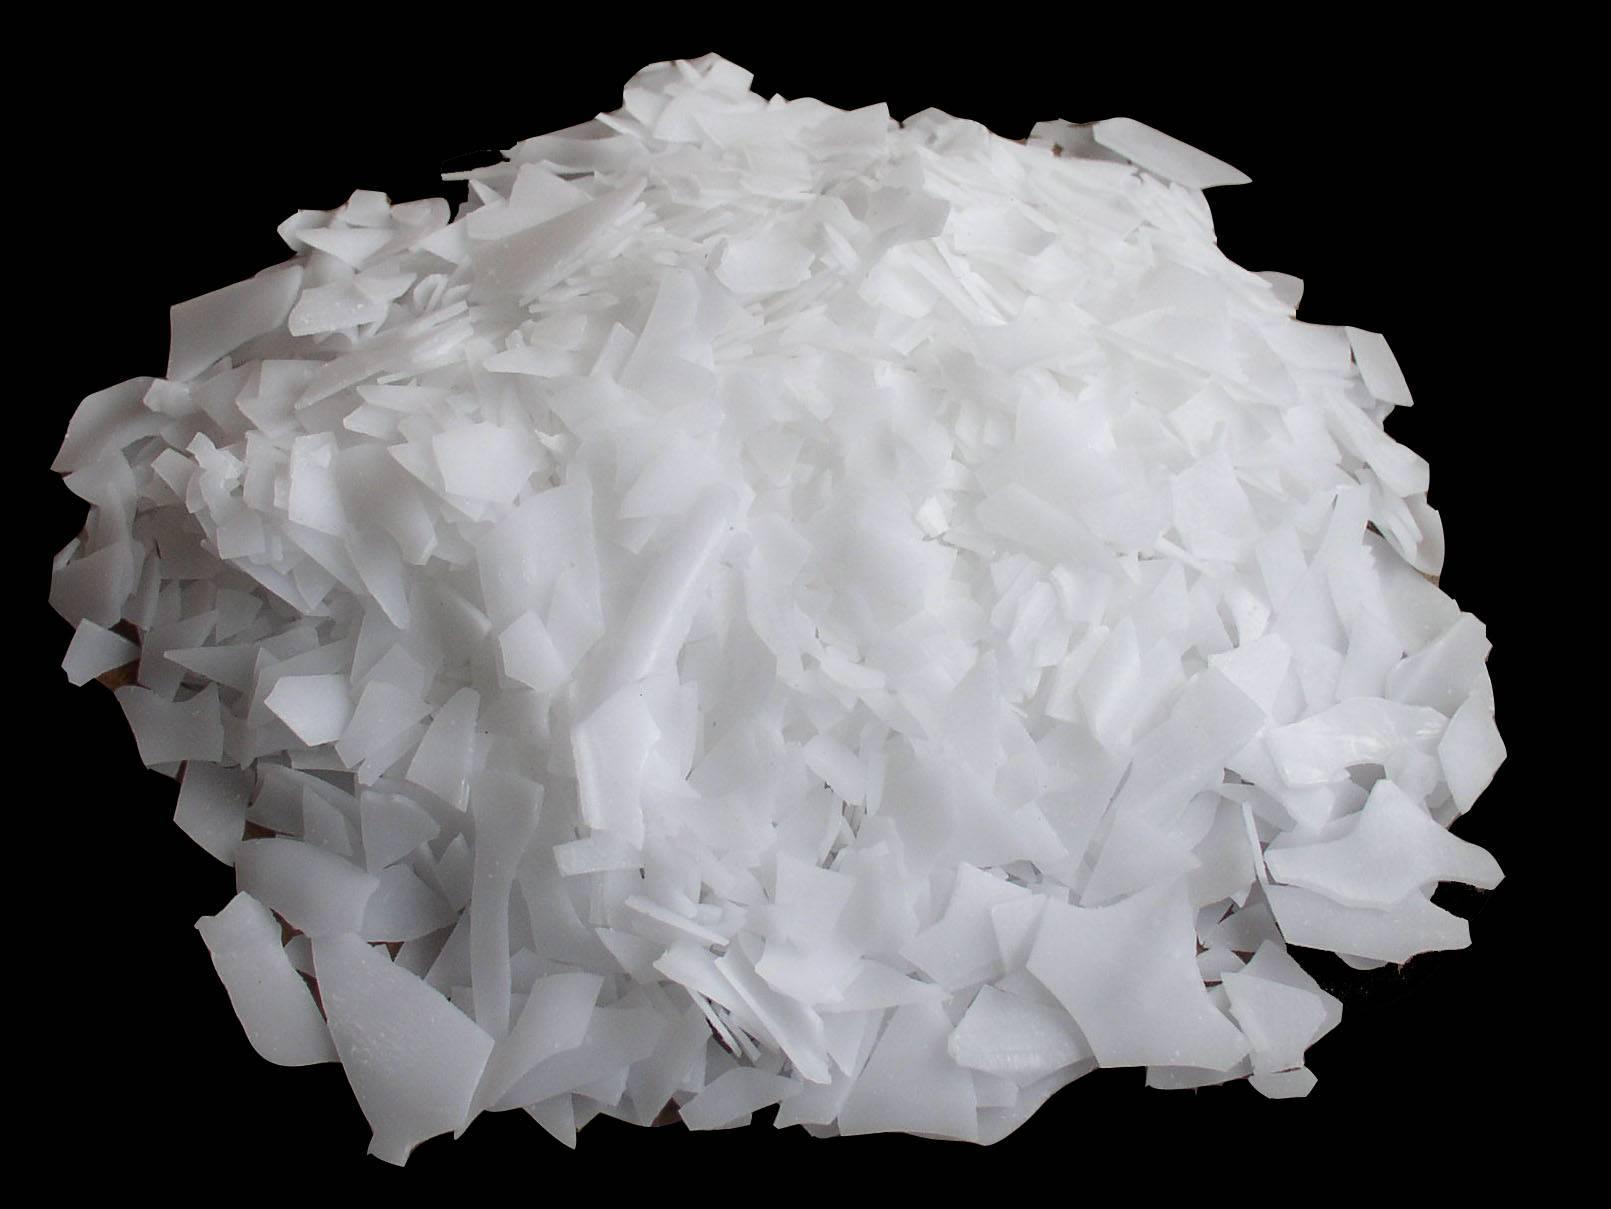 Polyethylene Wax for PVC Pipes